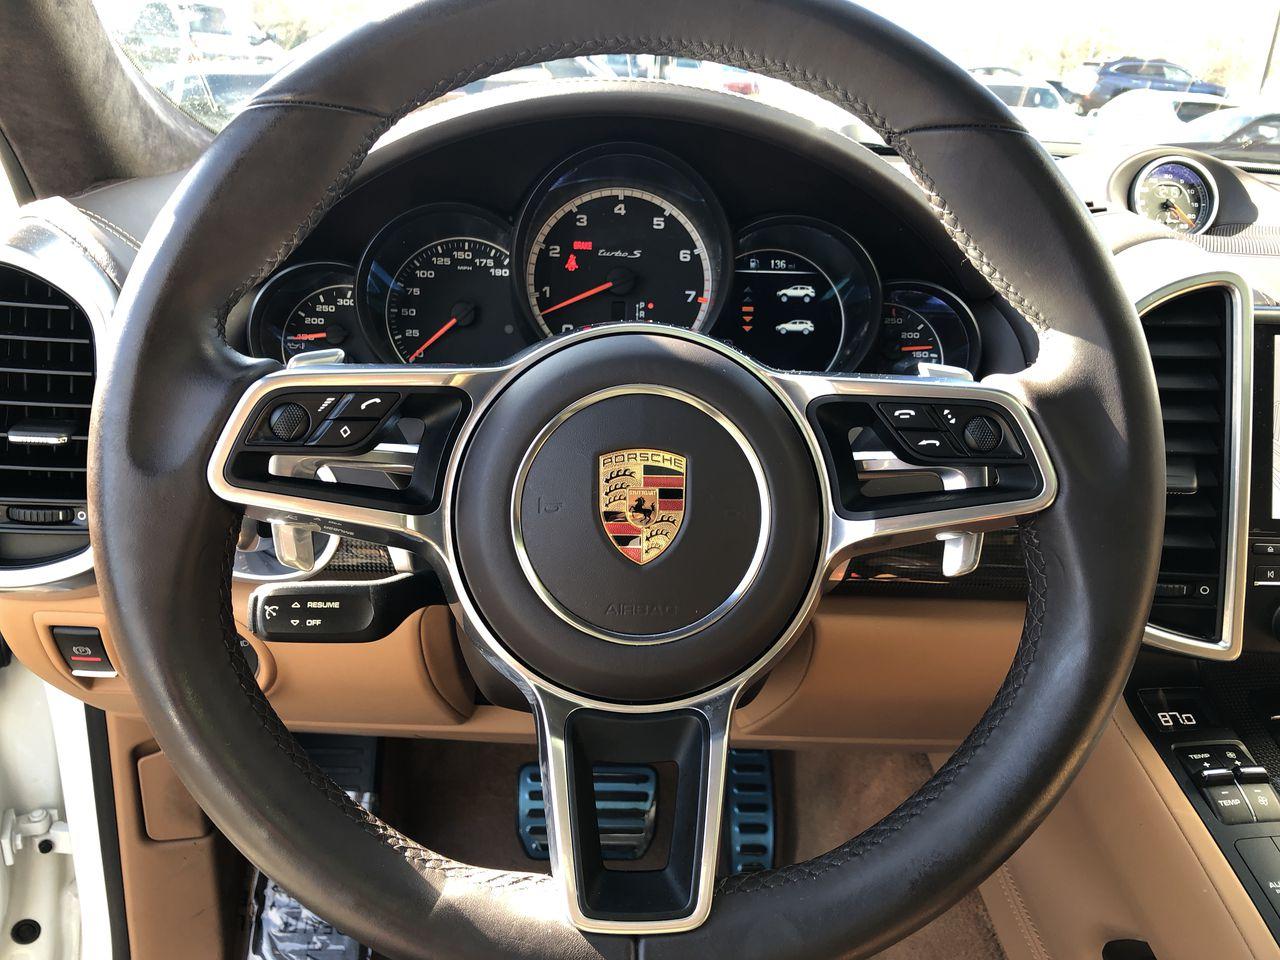 Pre-Owned 2018 Porsche Cayenne Turbo S